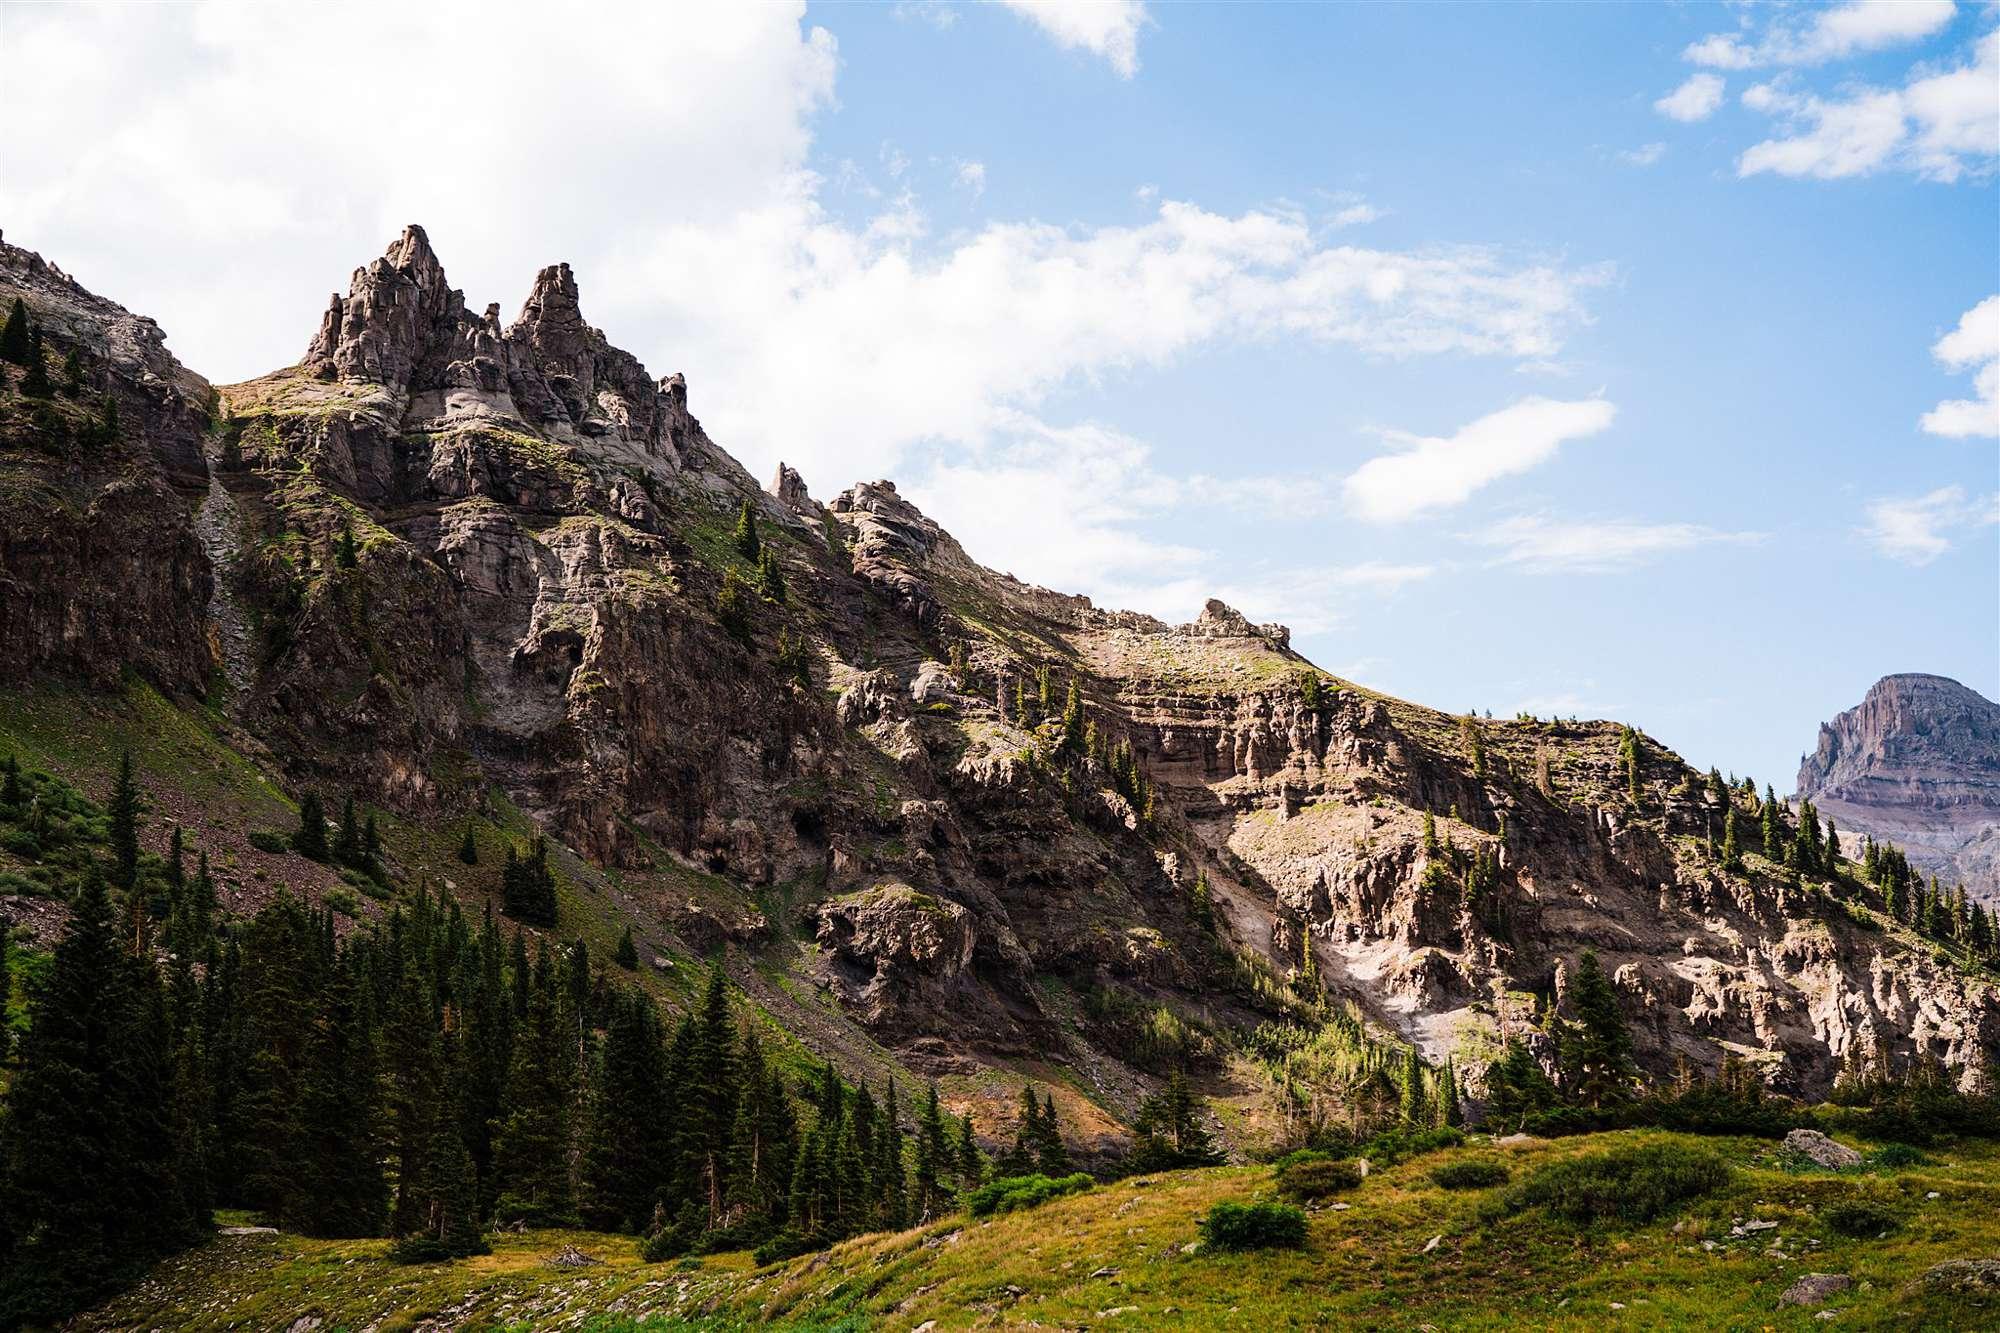 Colorado_Jeeping_Elopement_Emily_Matt_The_Foxes_Photography_0016.jpg